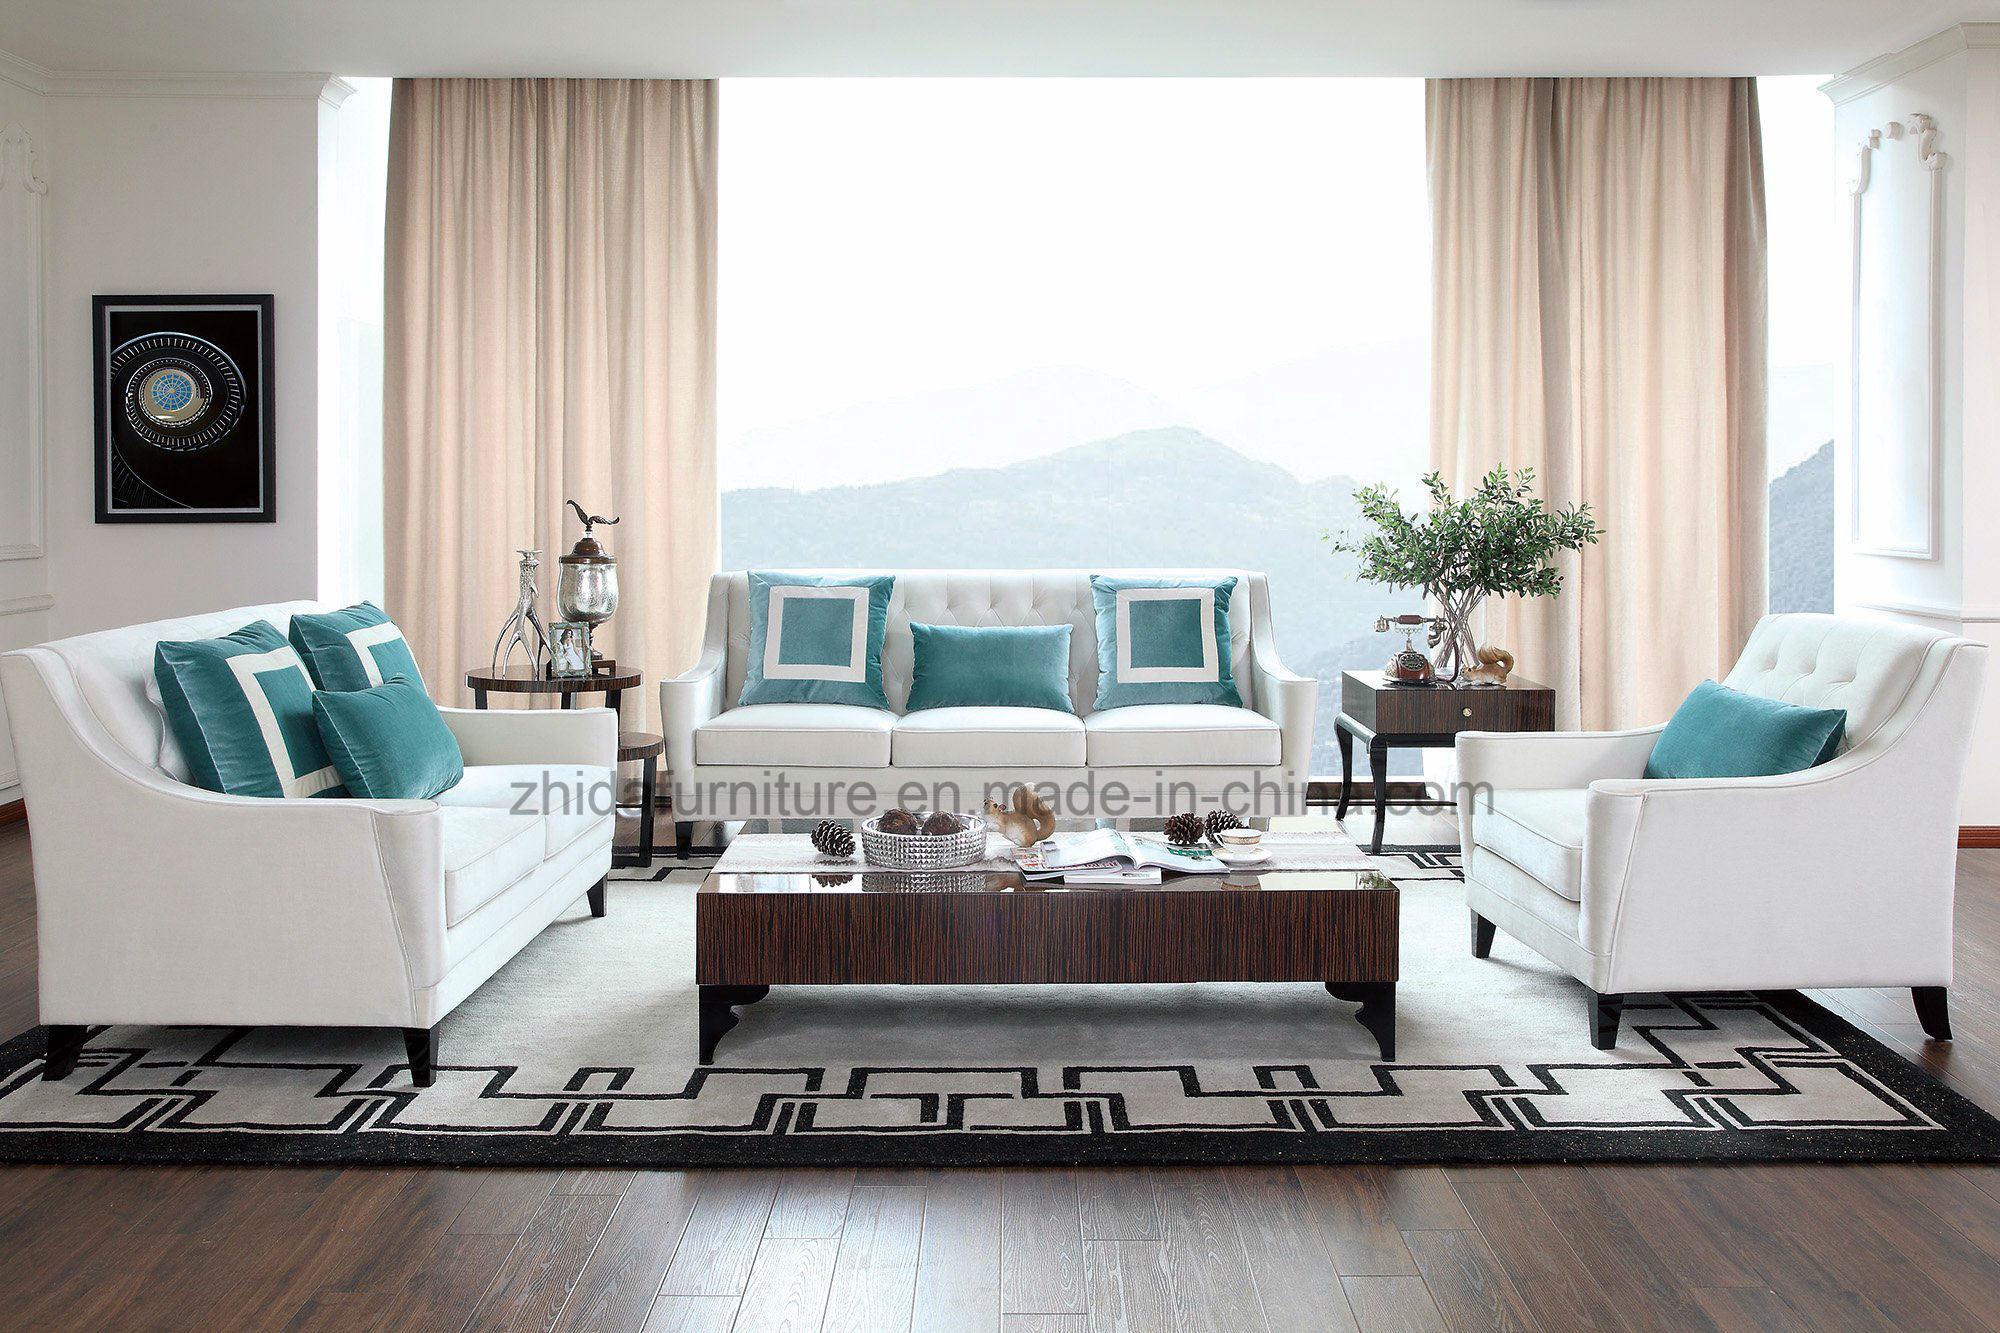 China Good Sales Sofa for Living Room - China Home Furniture, Living ...